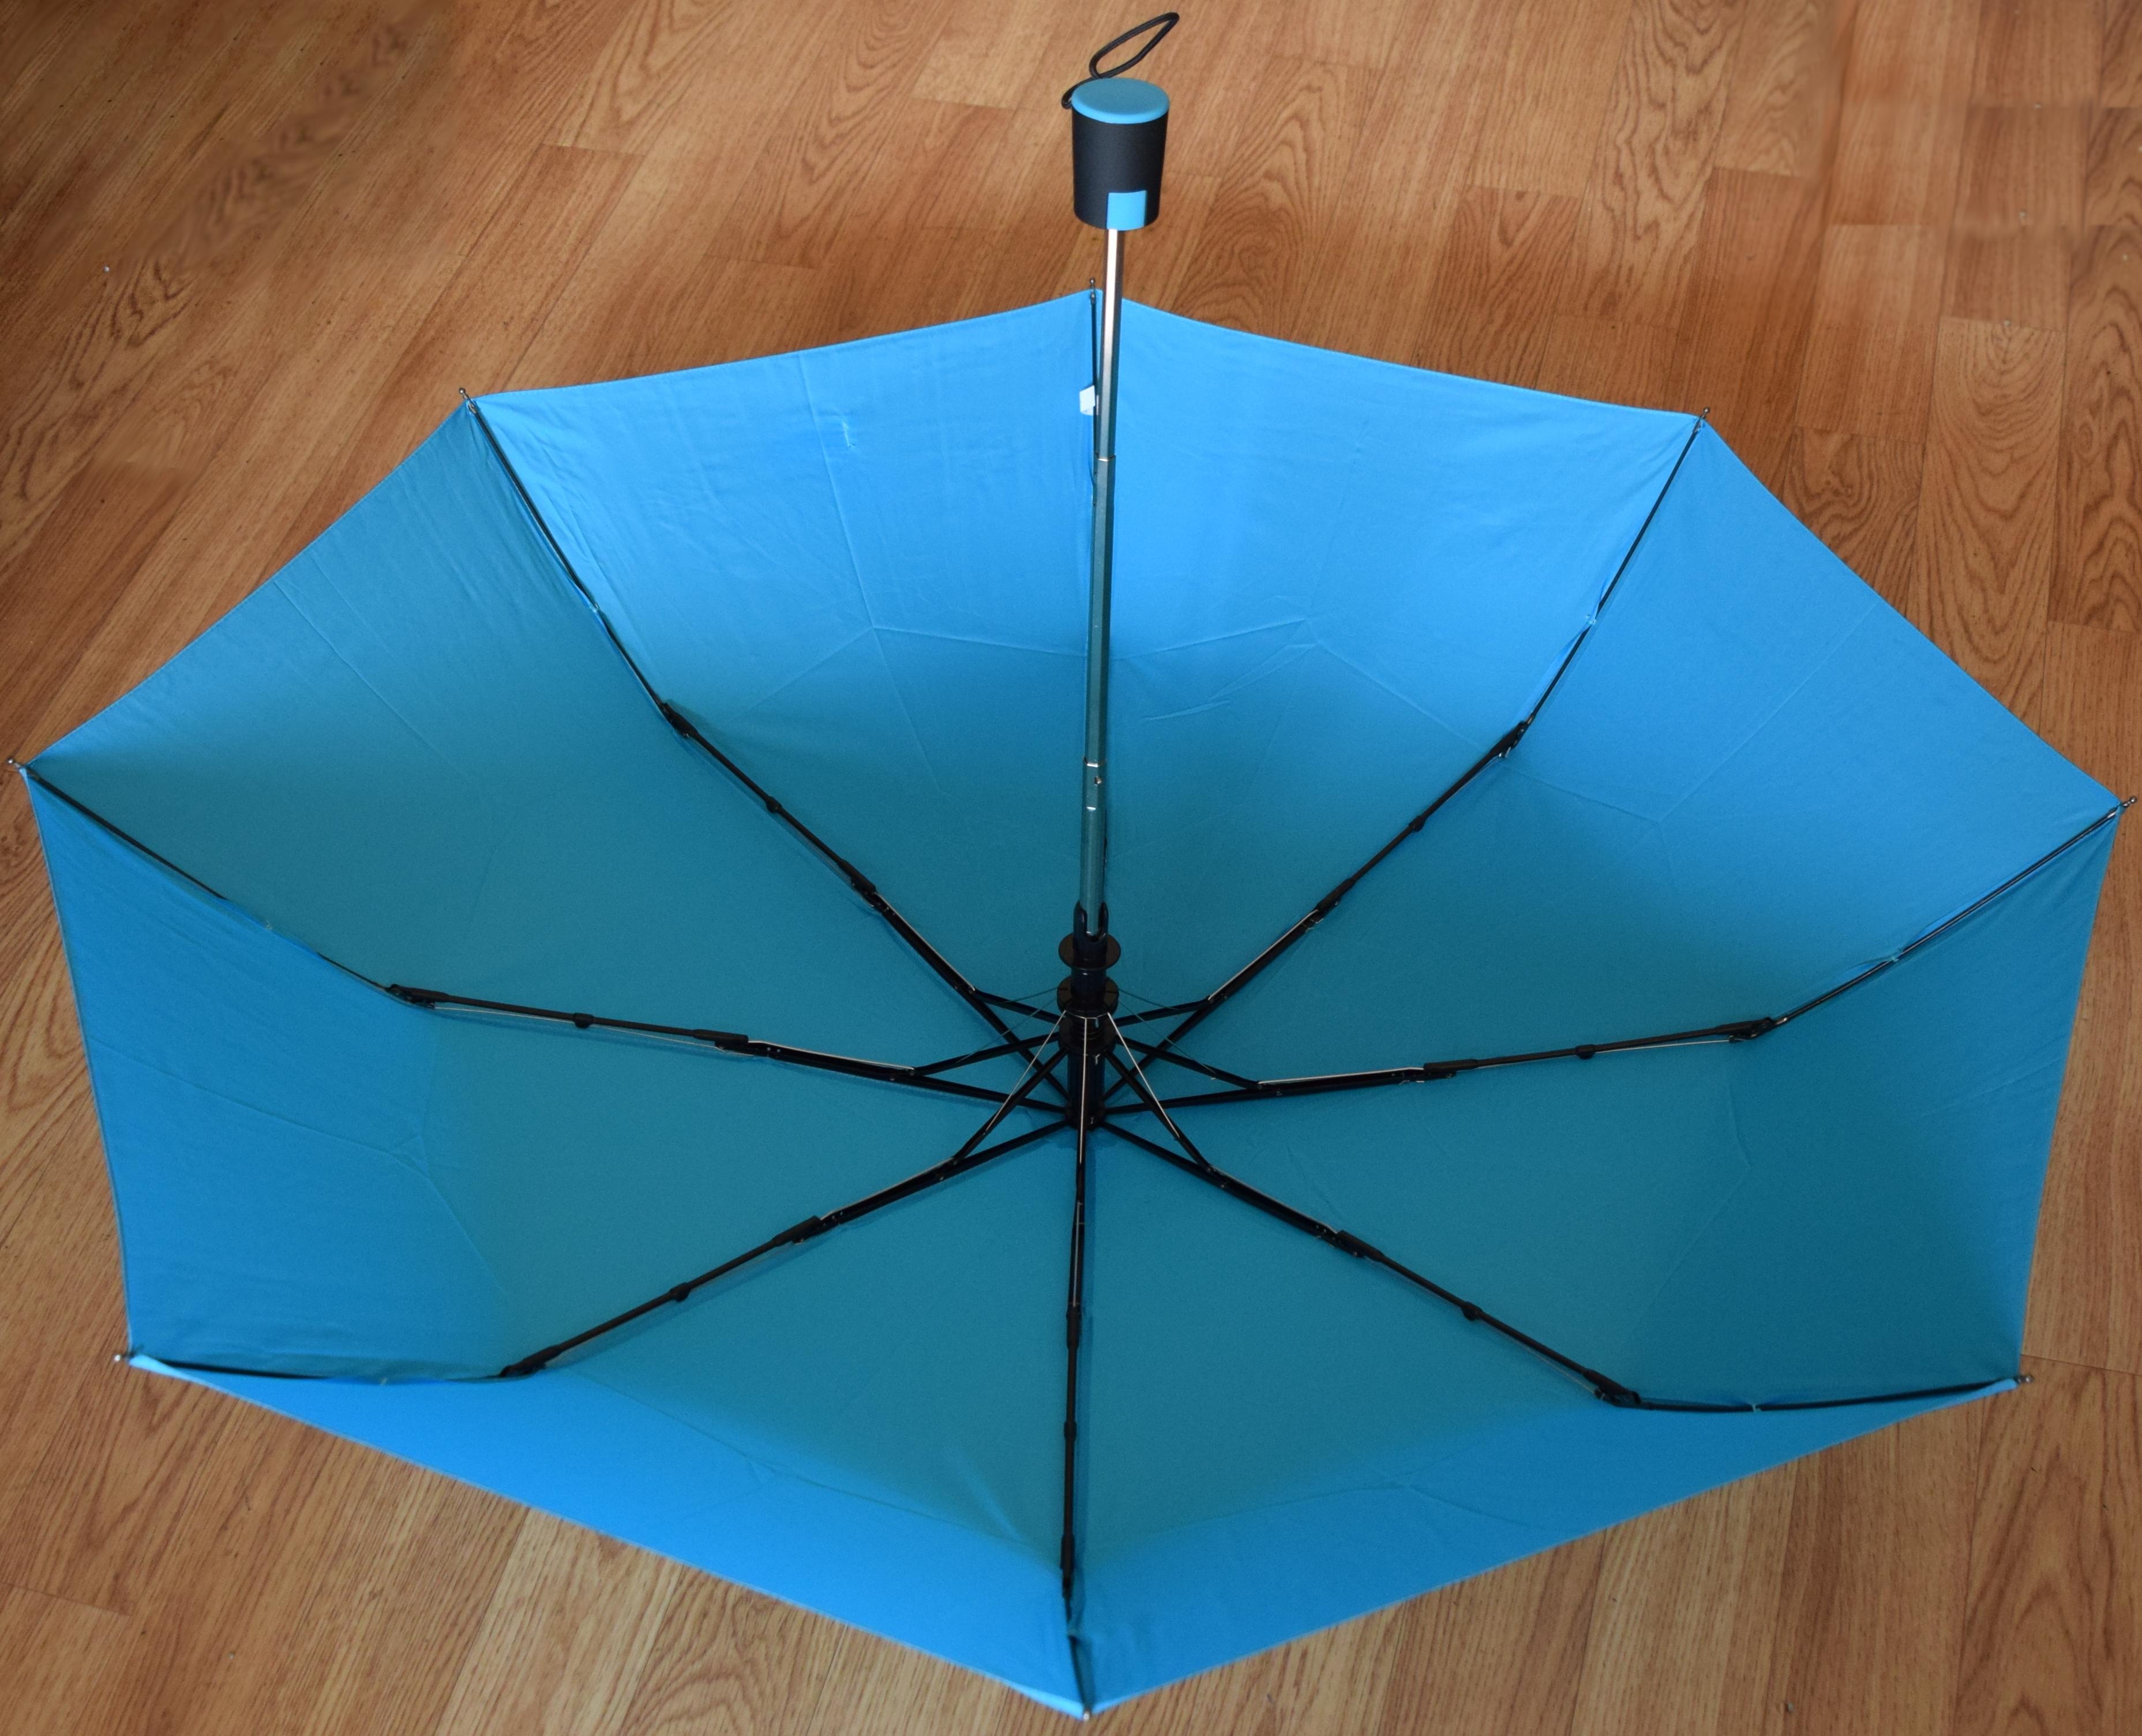 Halloween Umbrella using EL Wire | Learn with Edwin Robotics